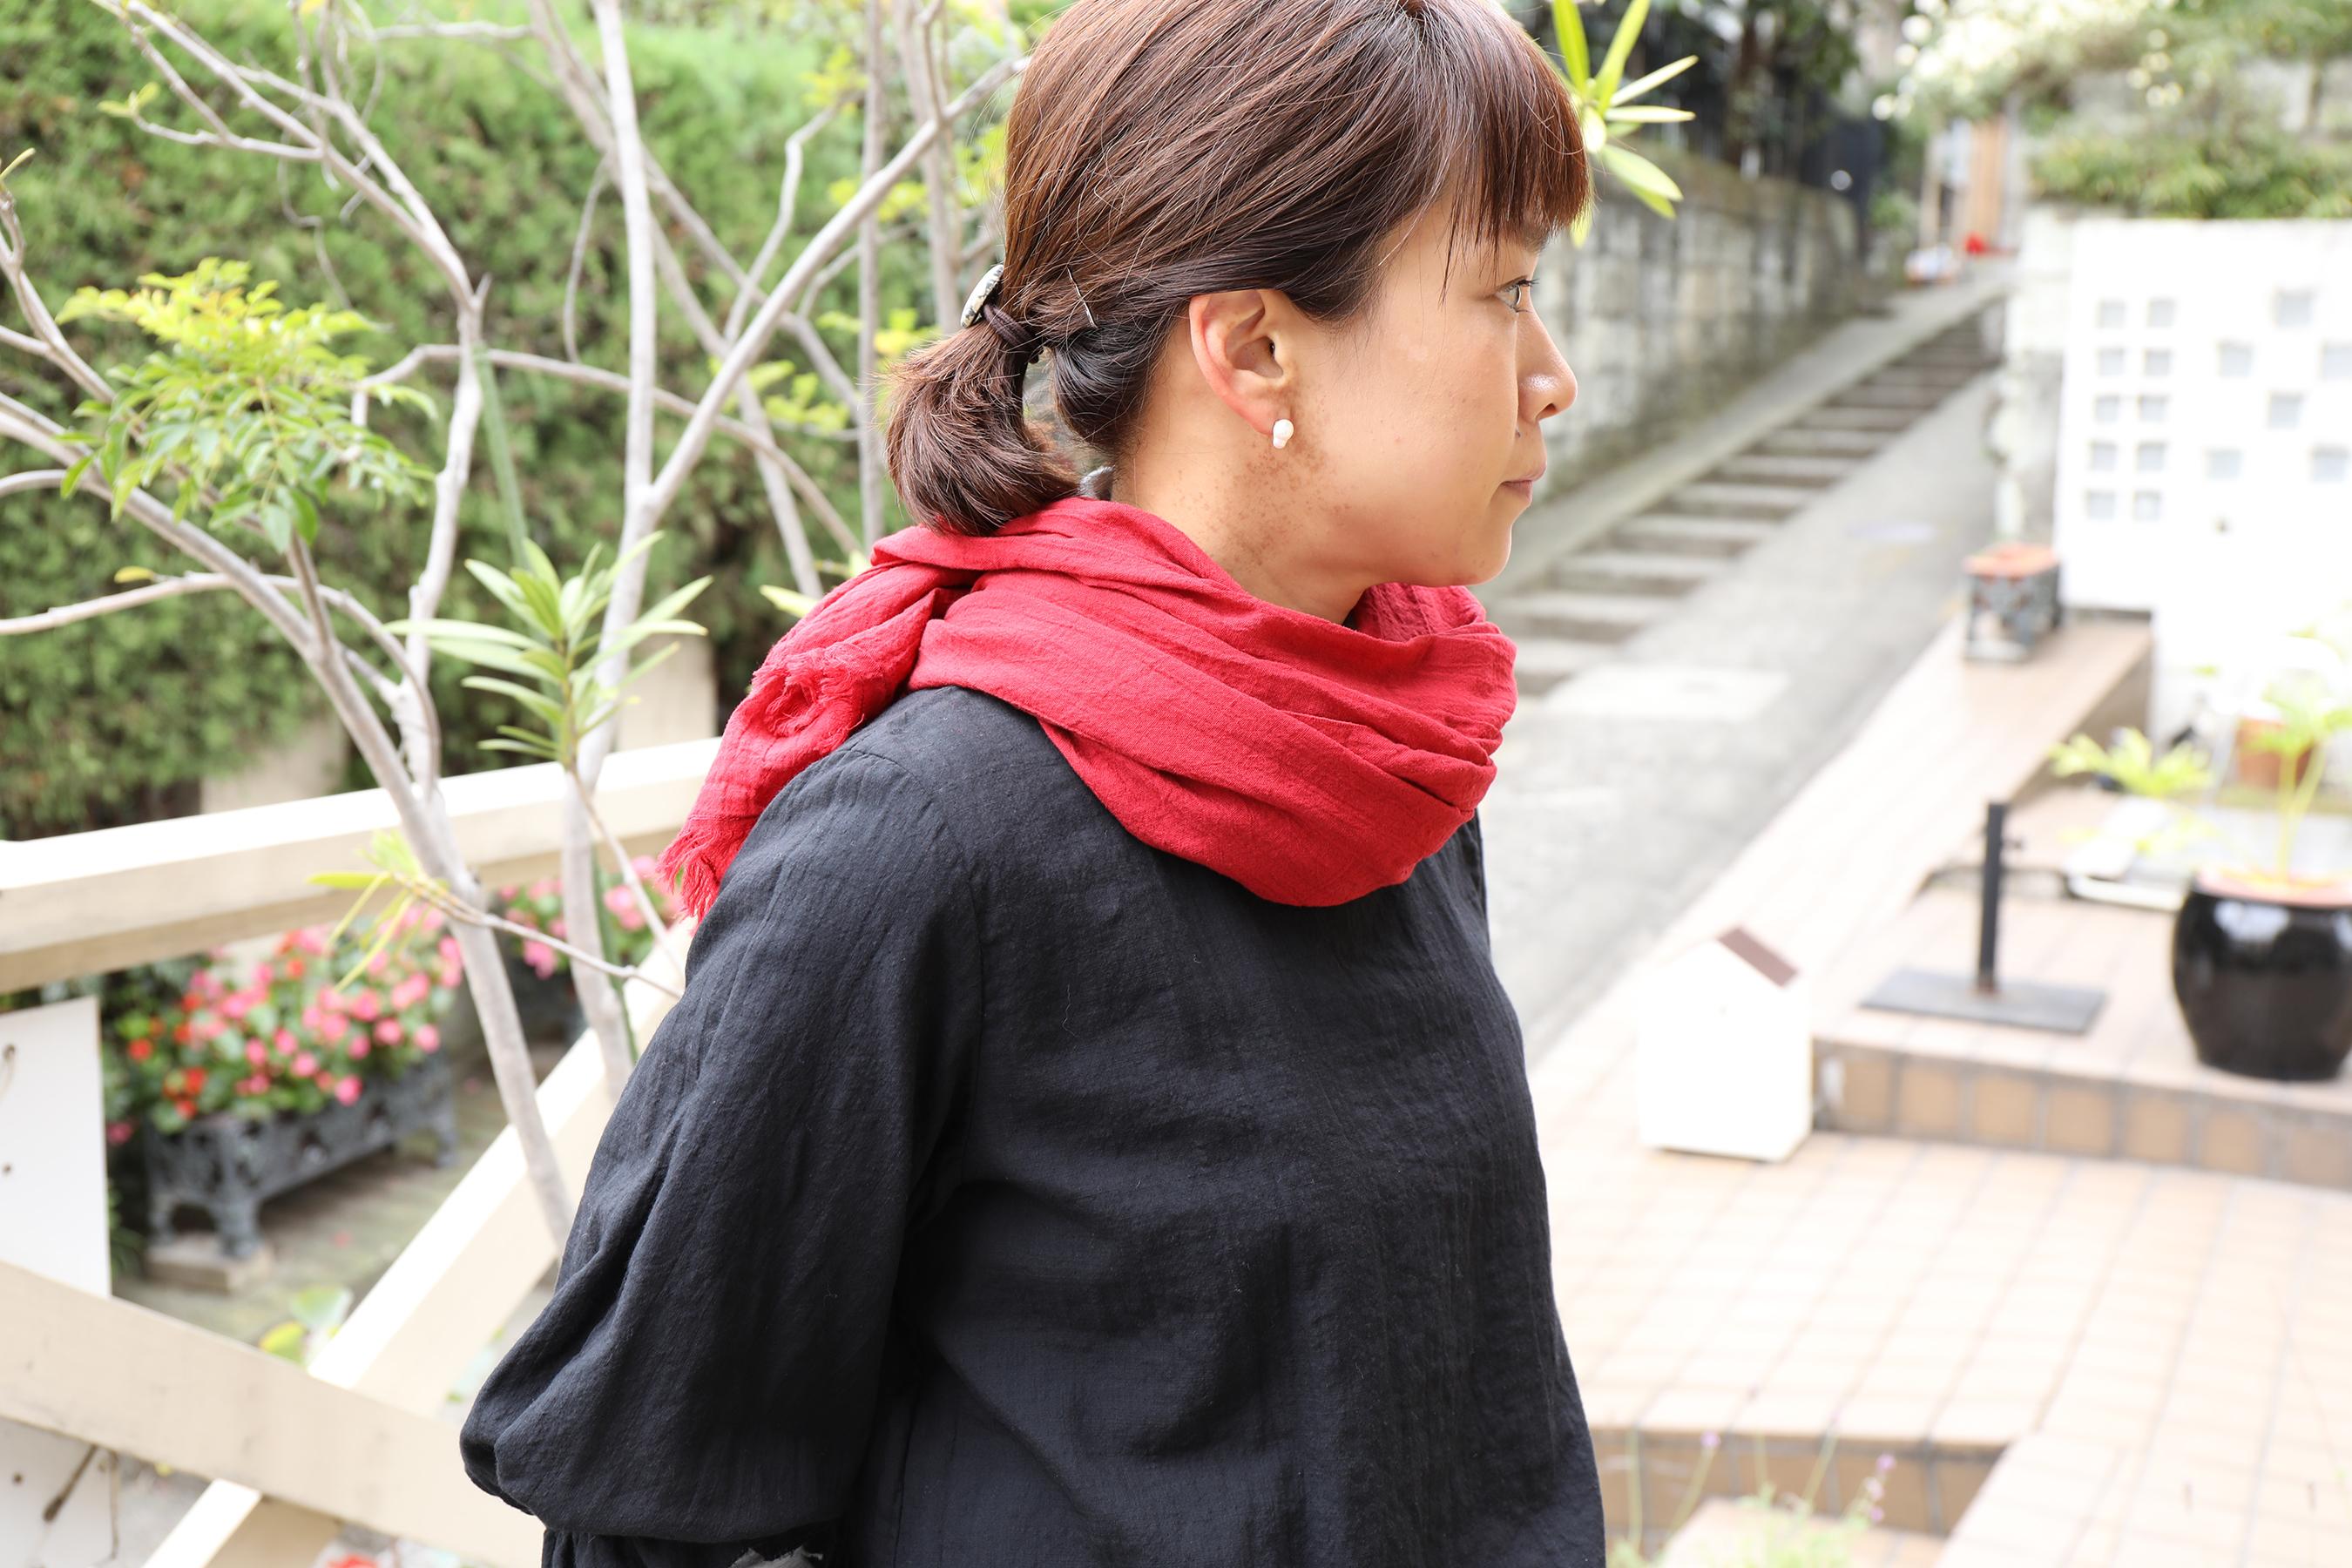 http://www.ao-daikanyama.com/information/upimg/9L4A7601.JPG